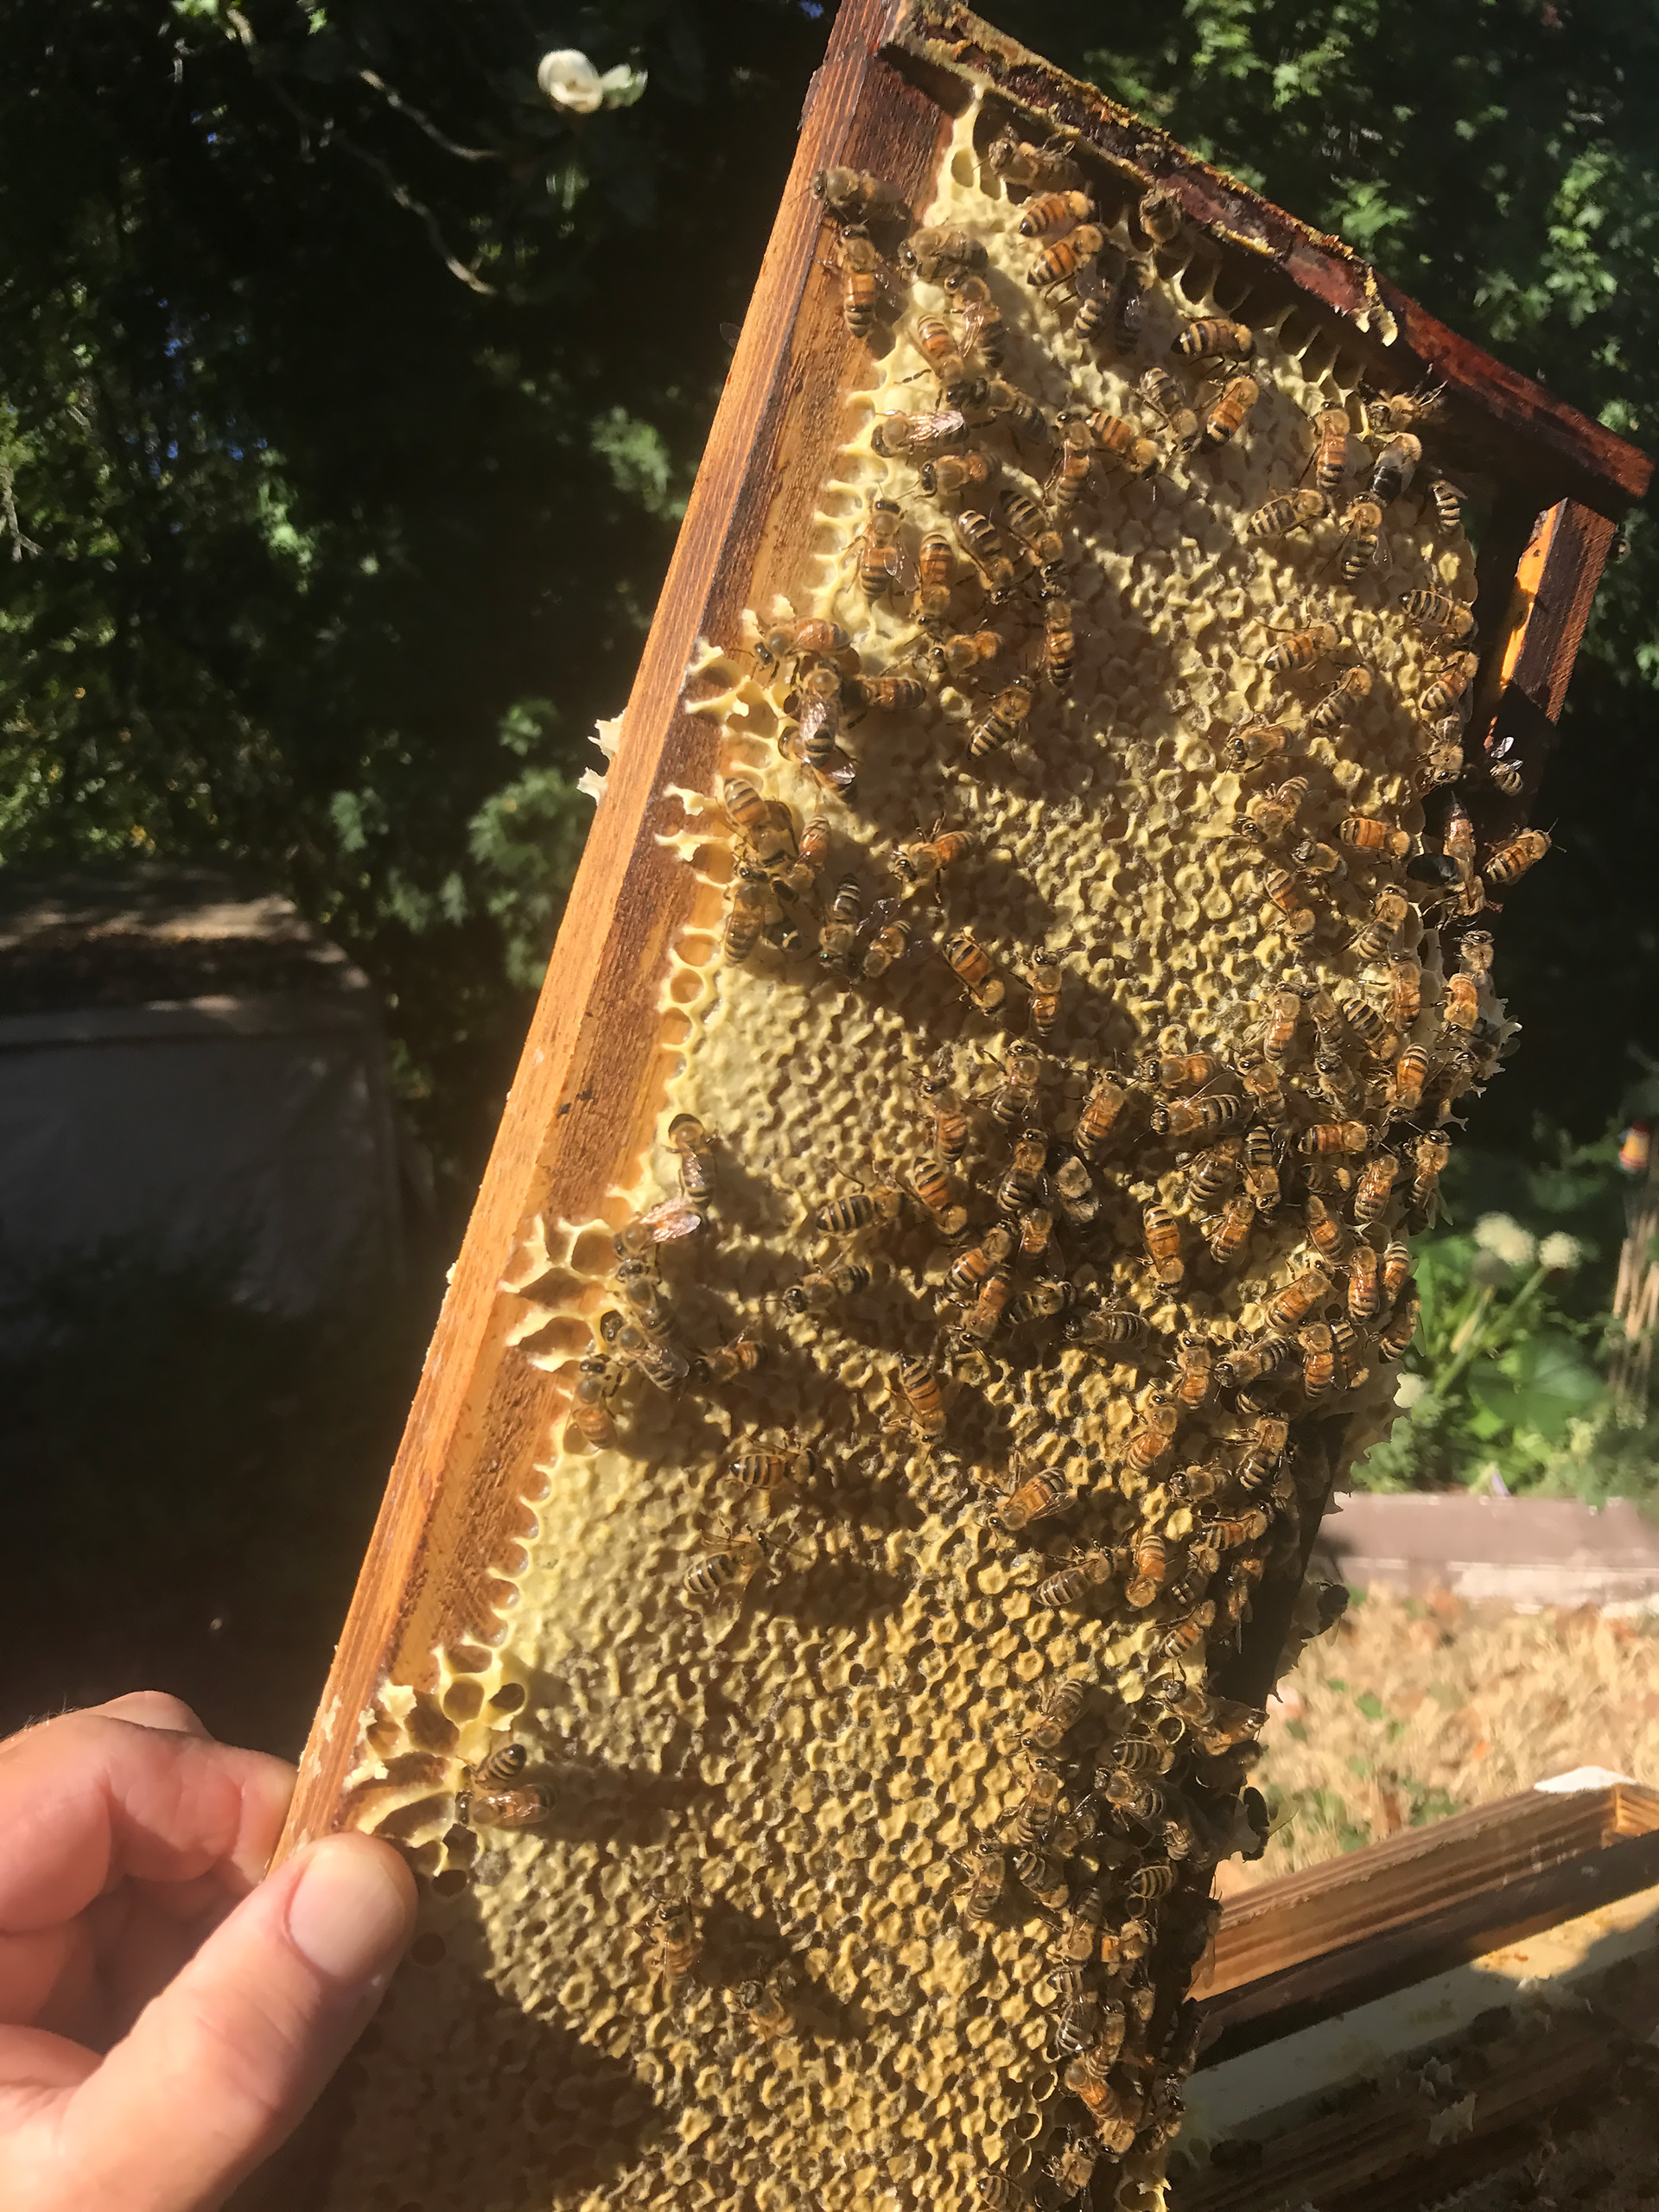 Dewitt Barker pulling honeycomb for the farmer's market from Santa Rosa hives.